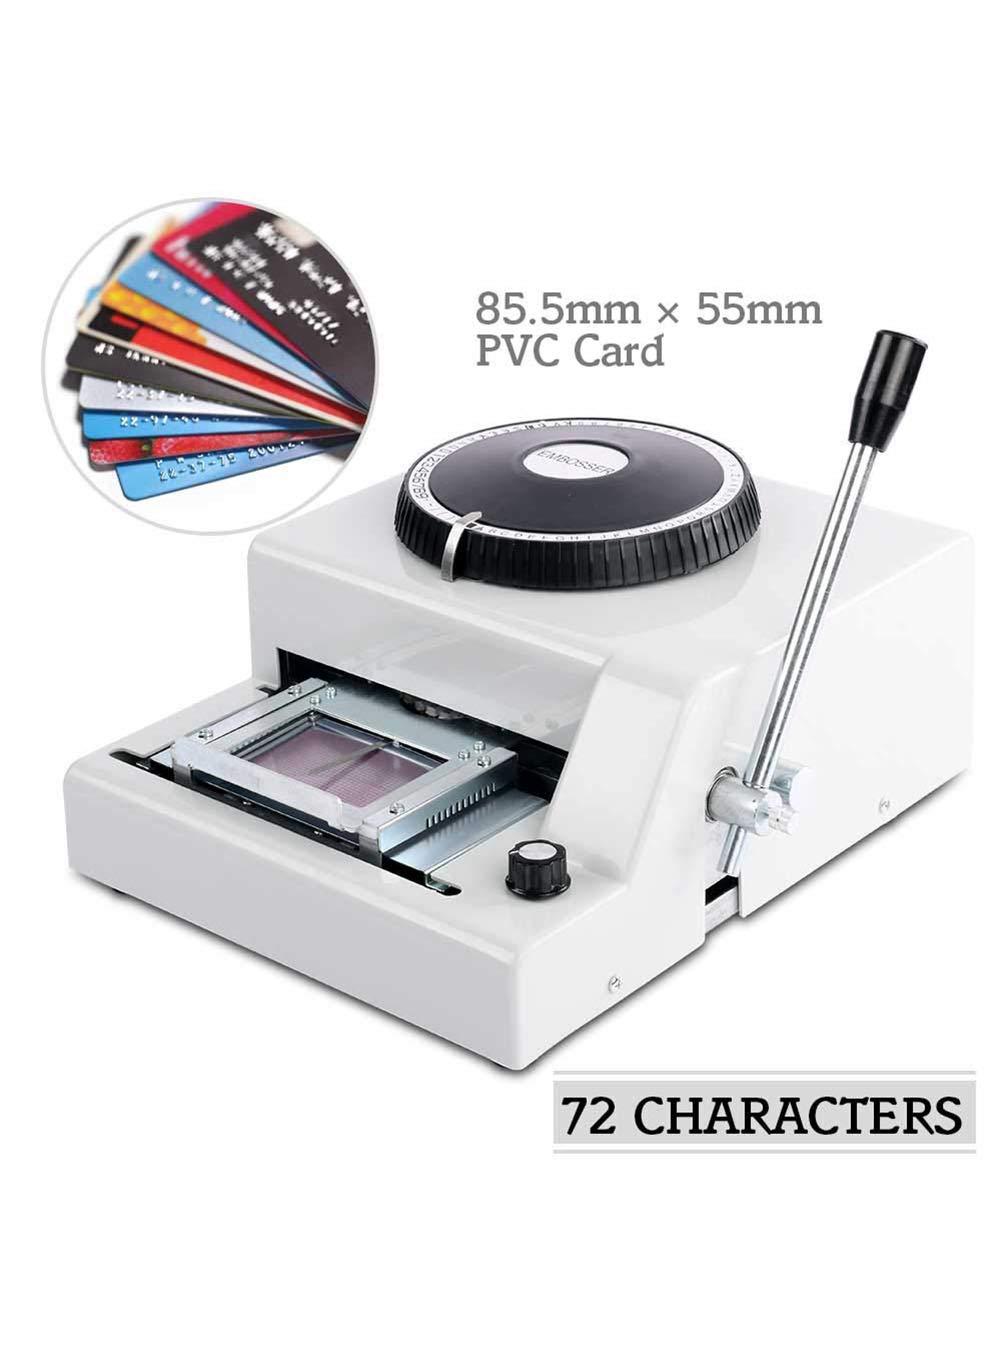 CalmMax Embossing Machine 72 Character PVC VIP Card Manual Embosser Machine